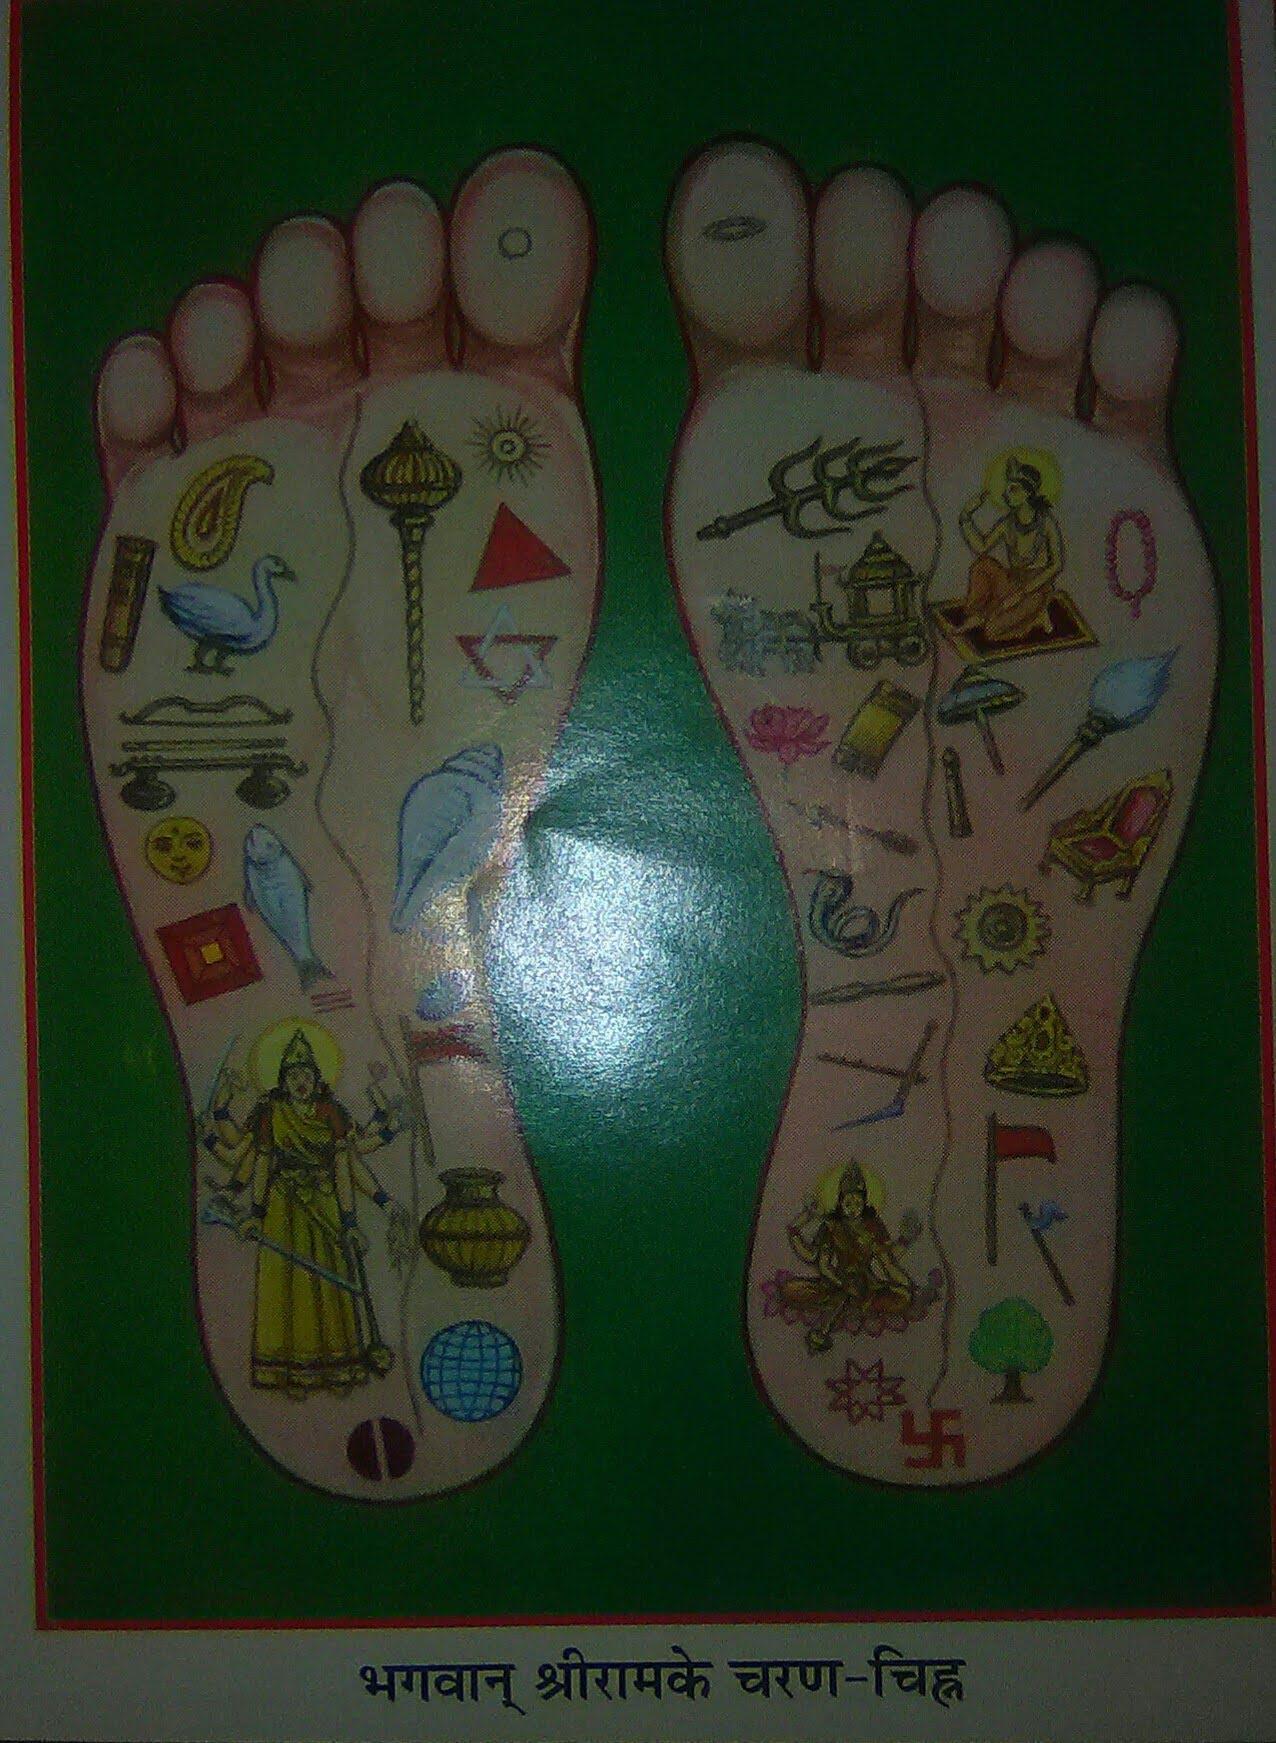 48 Charan Chinh of Lord Shri Ram and Devi Sita